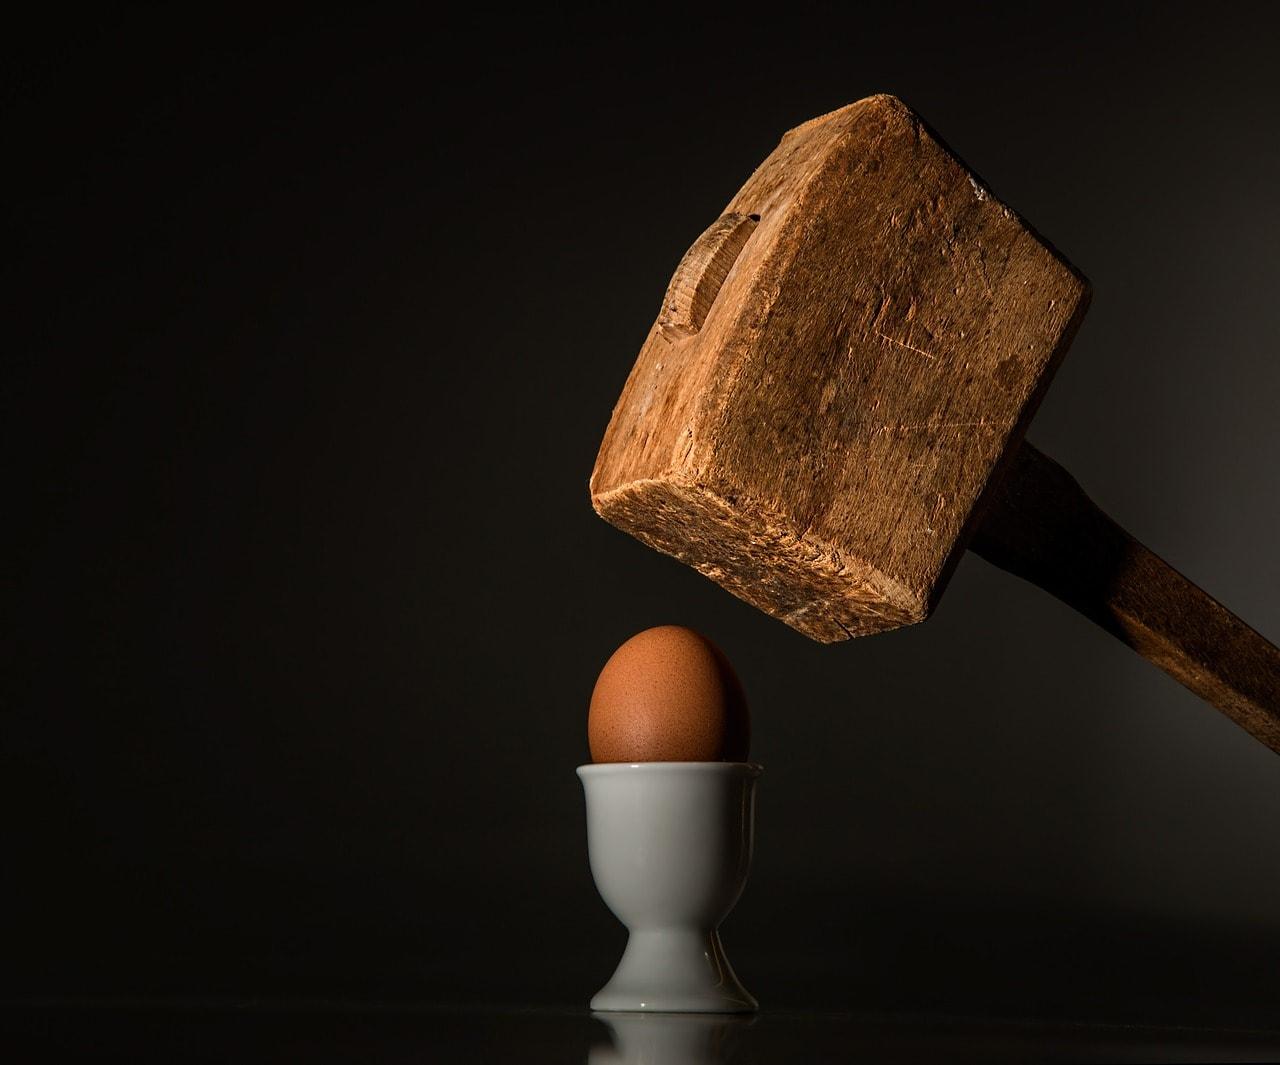 Martillo golpeando huevo